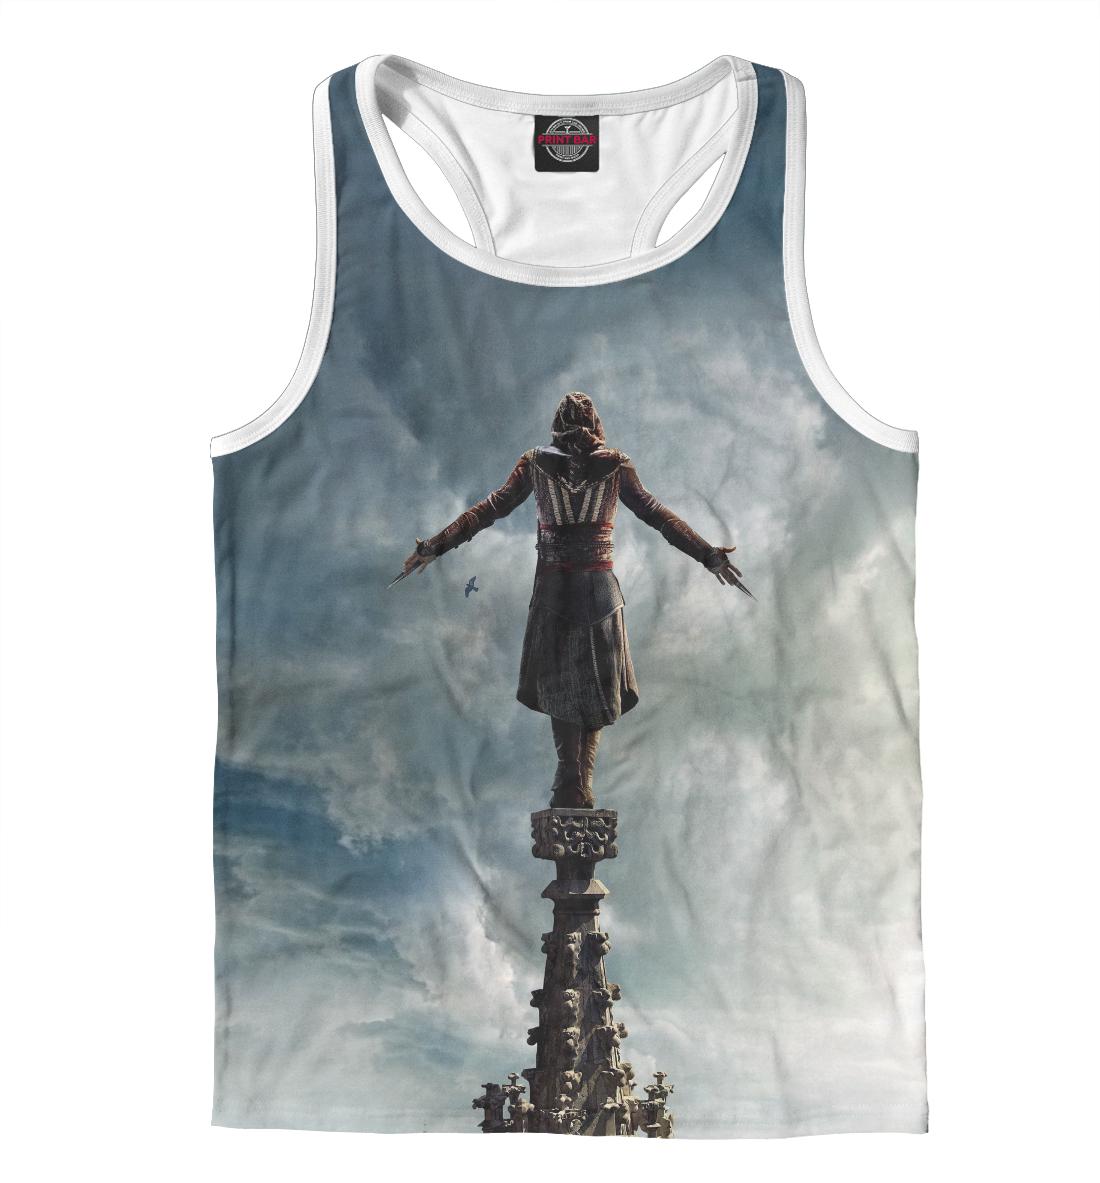 Купить Майка для мальчика Assassin's Creed KNO-232494-mayb-2